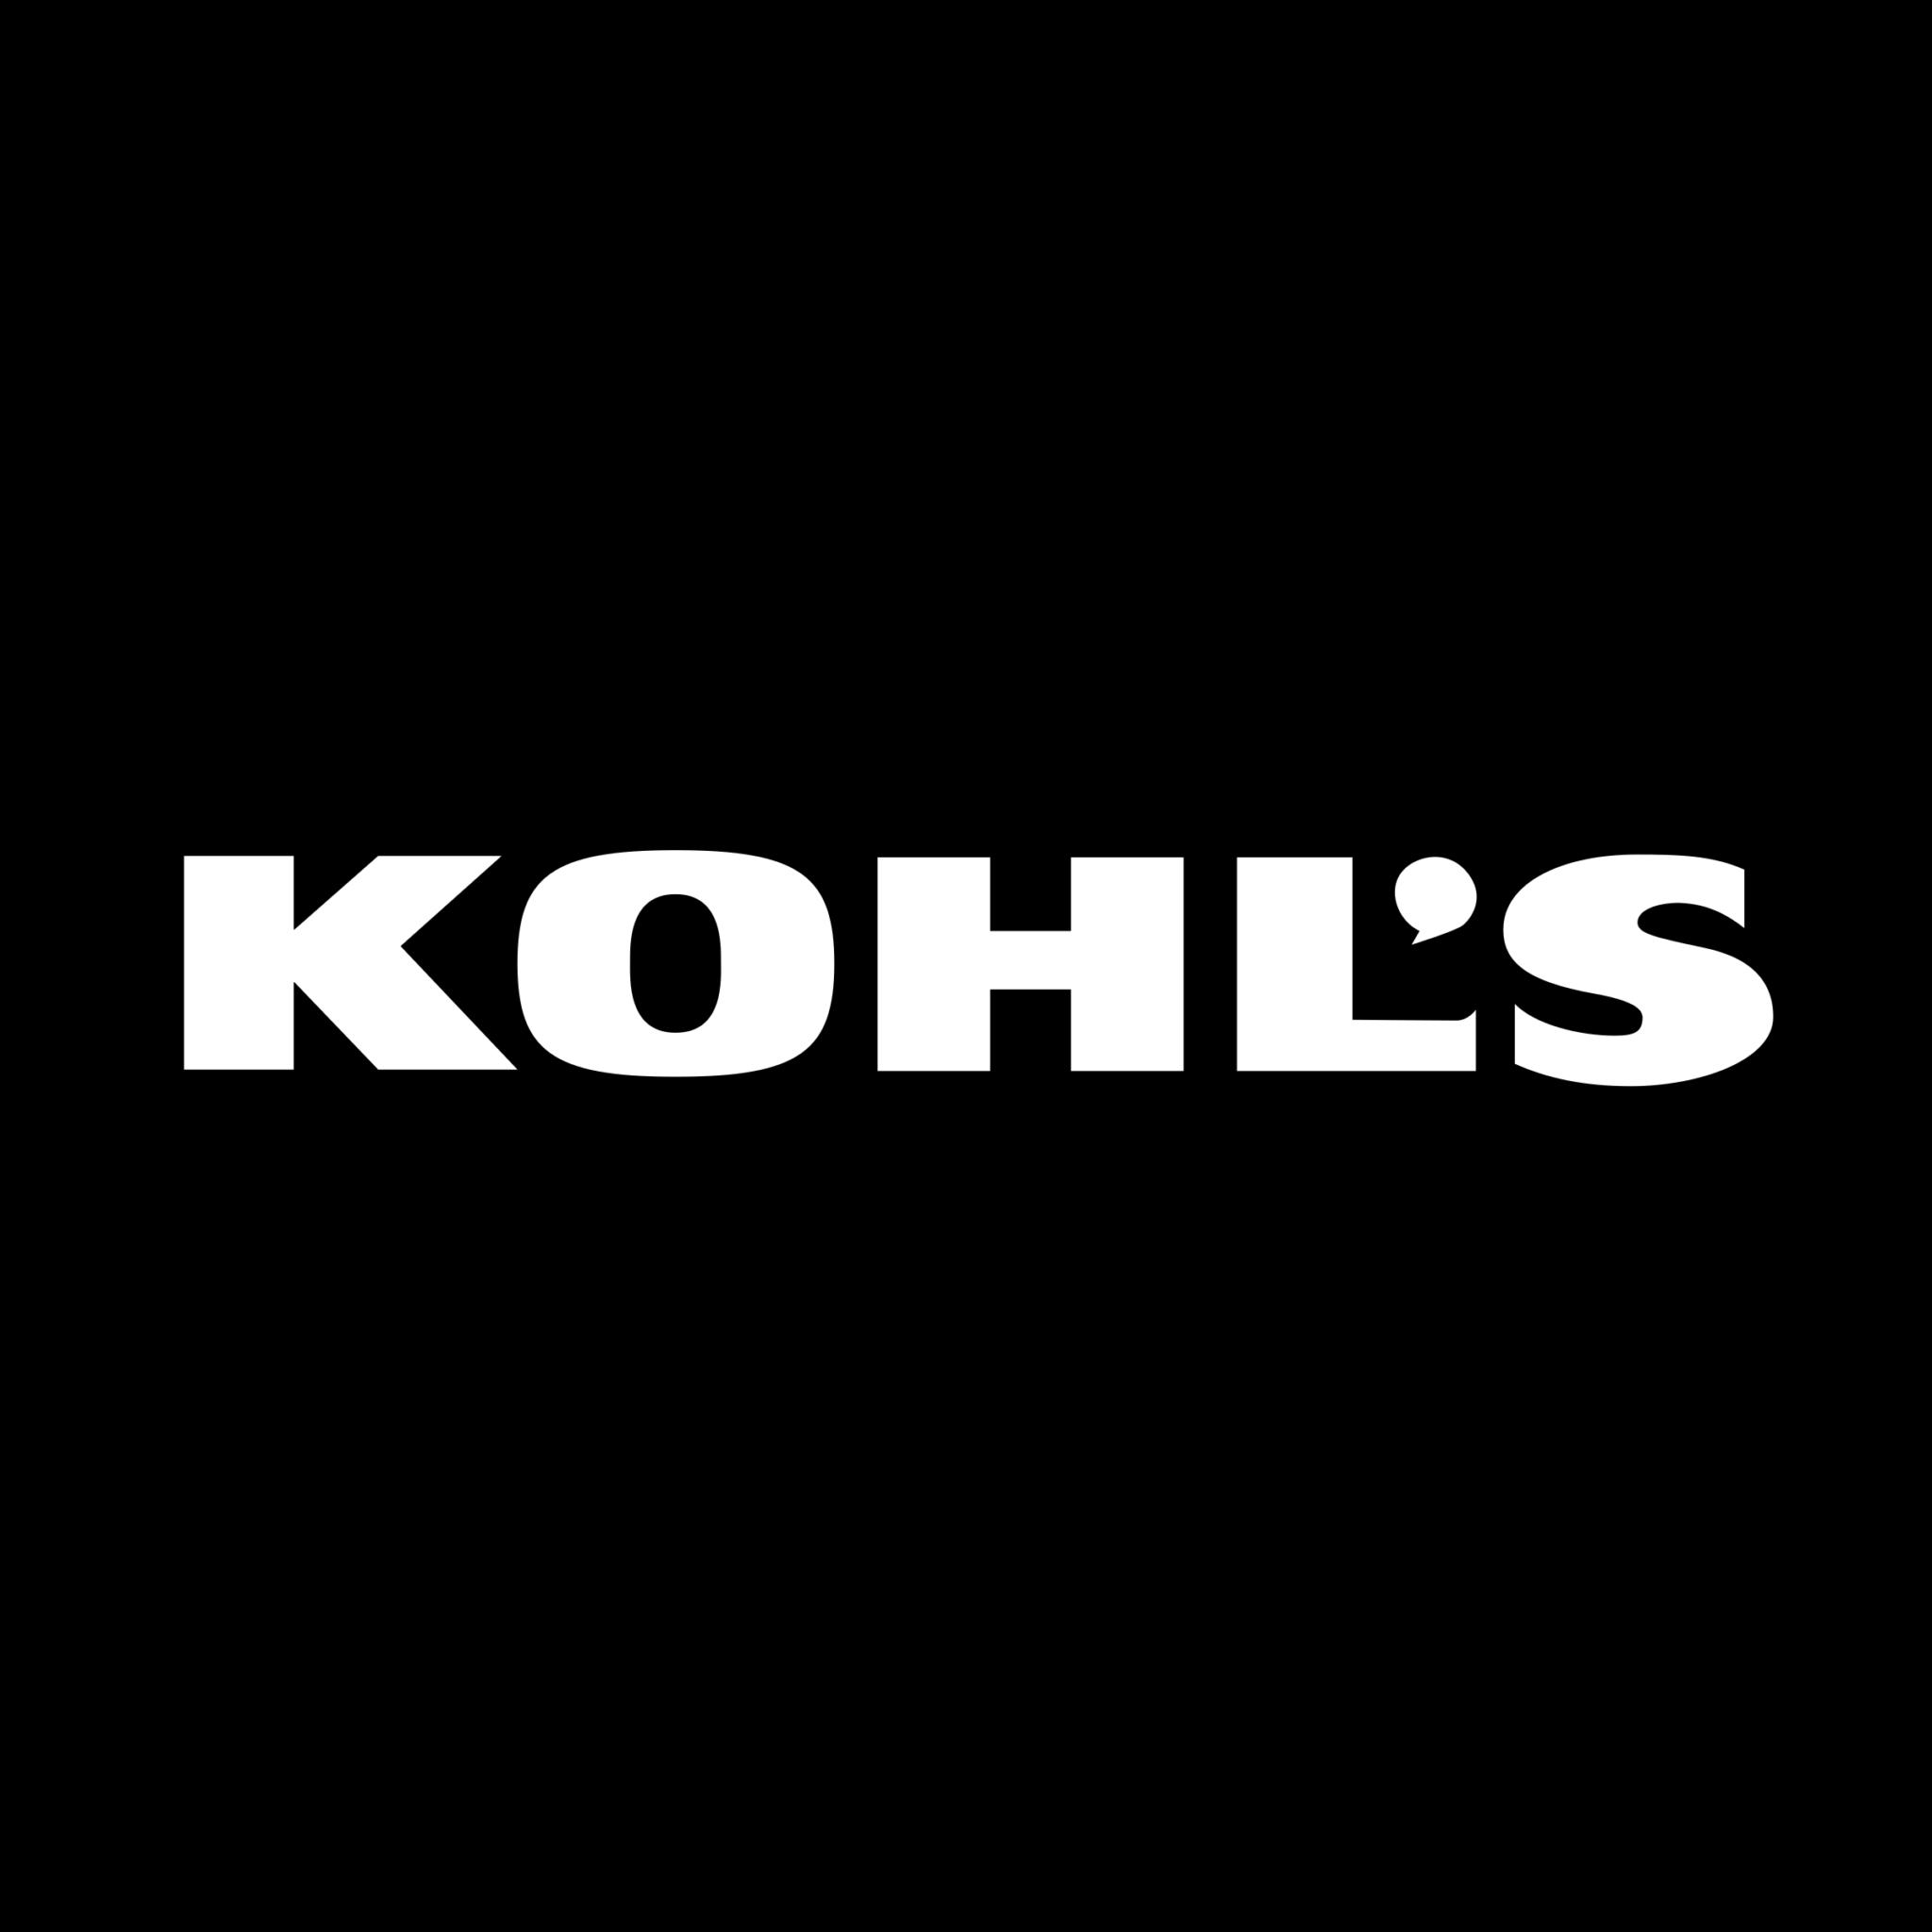 Kohls Logo Sunny Perks